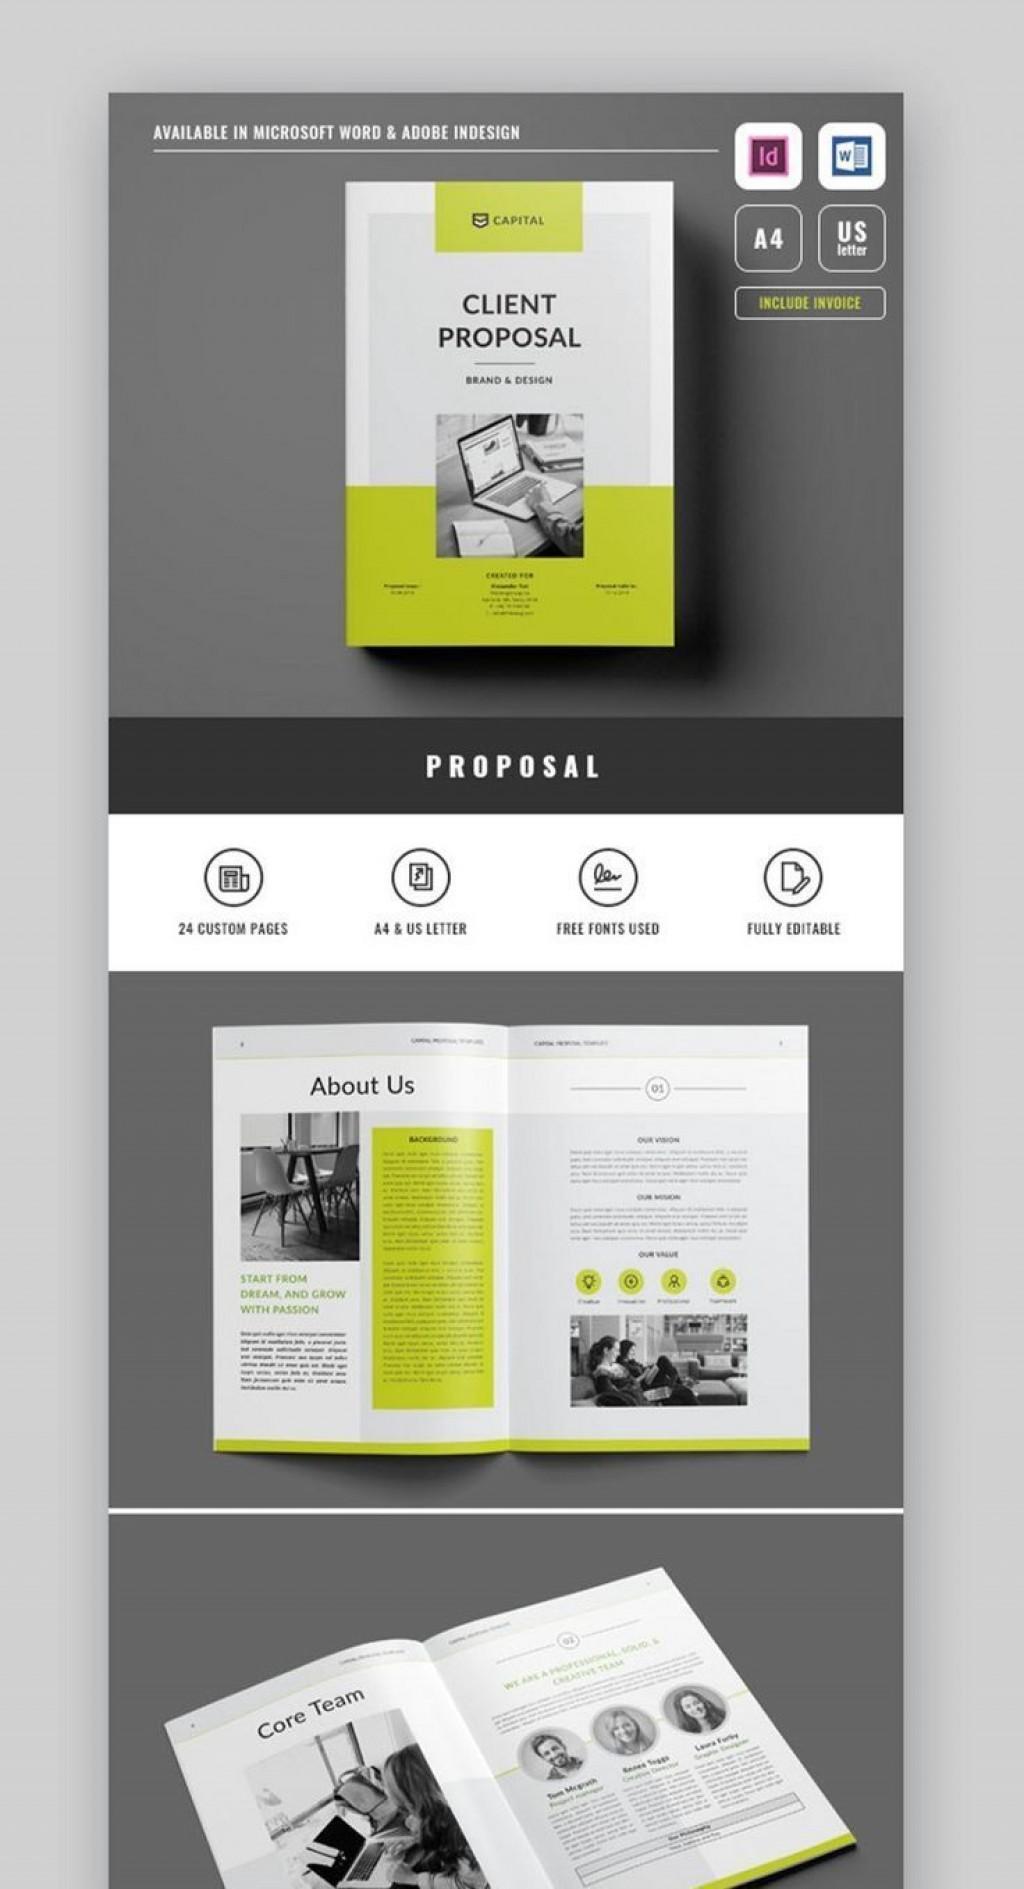 002 Imposing Free Online Brochure Template For Word Image  MicrosoftLarge